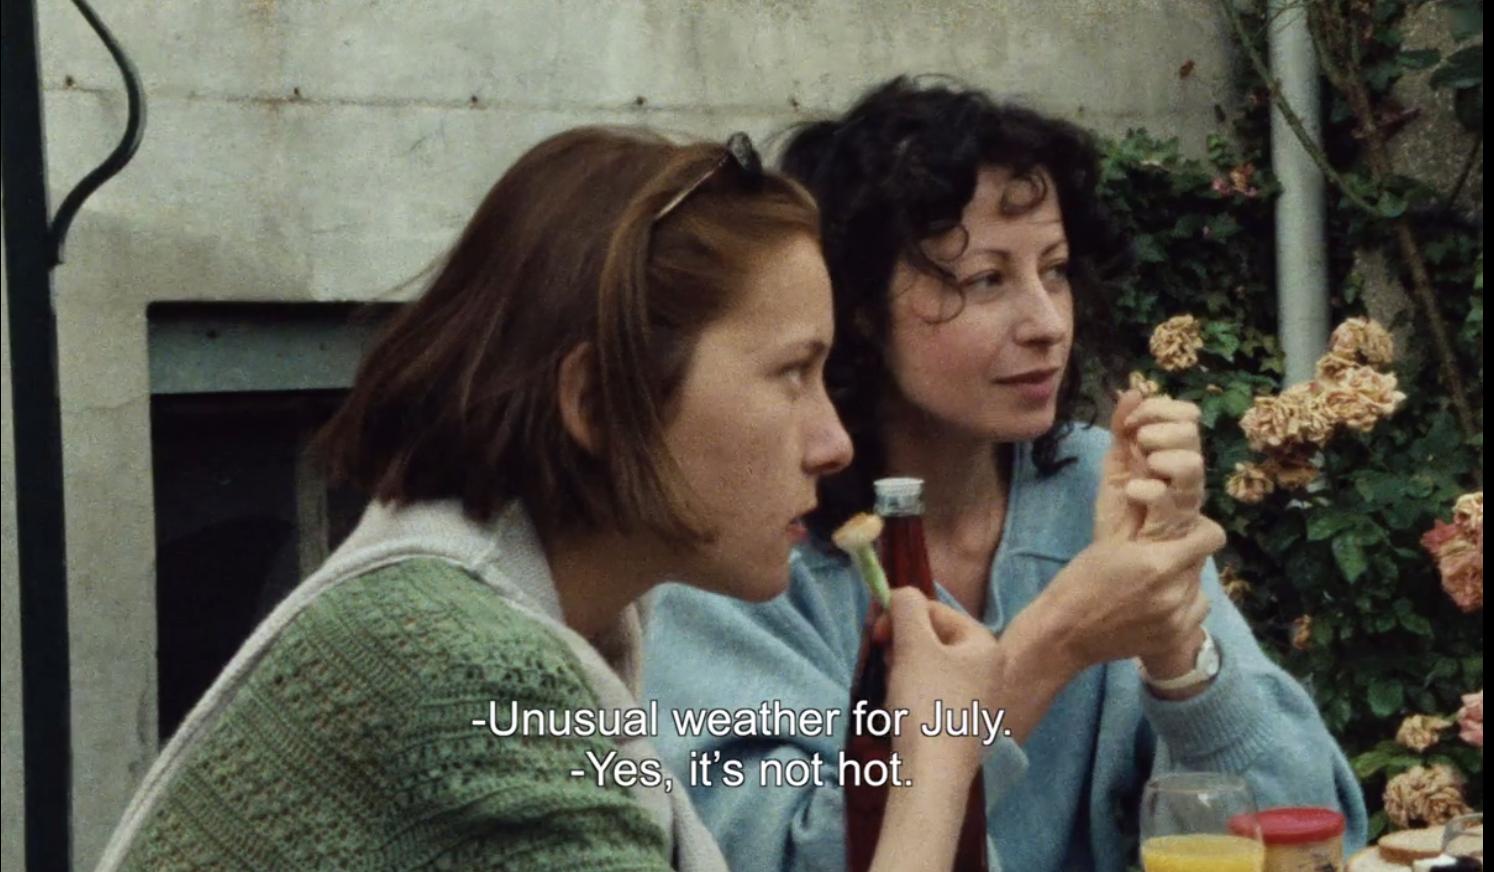 Le Rayon Vert (1986) Eric Rohmer - Marie Rivière | Aesthetic movies, Film  photography, Film stills